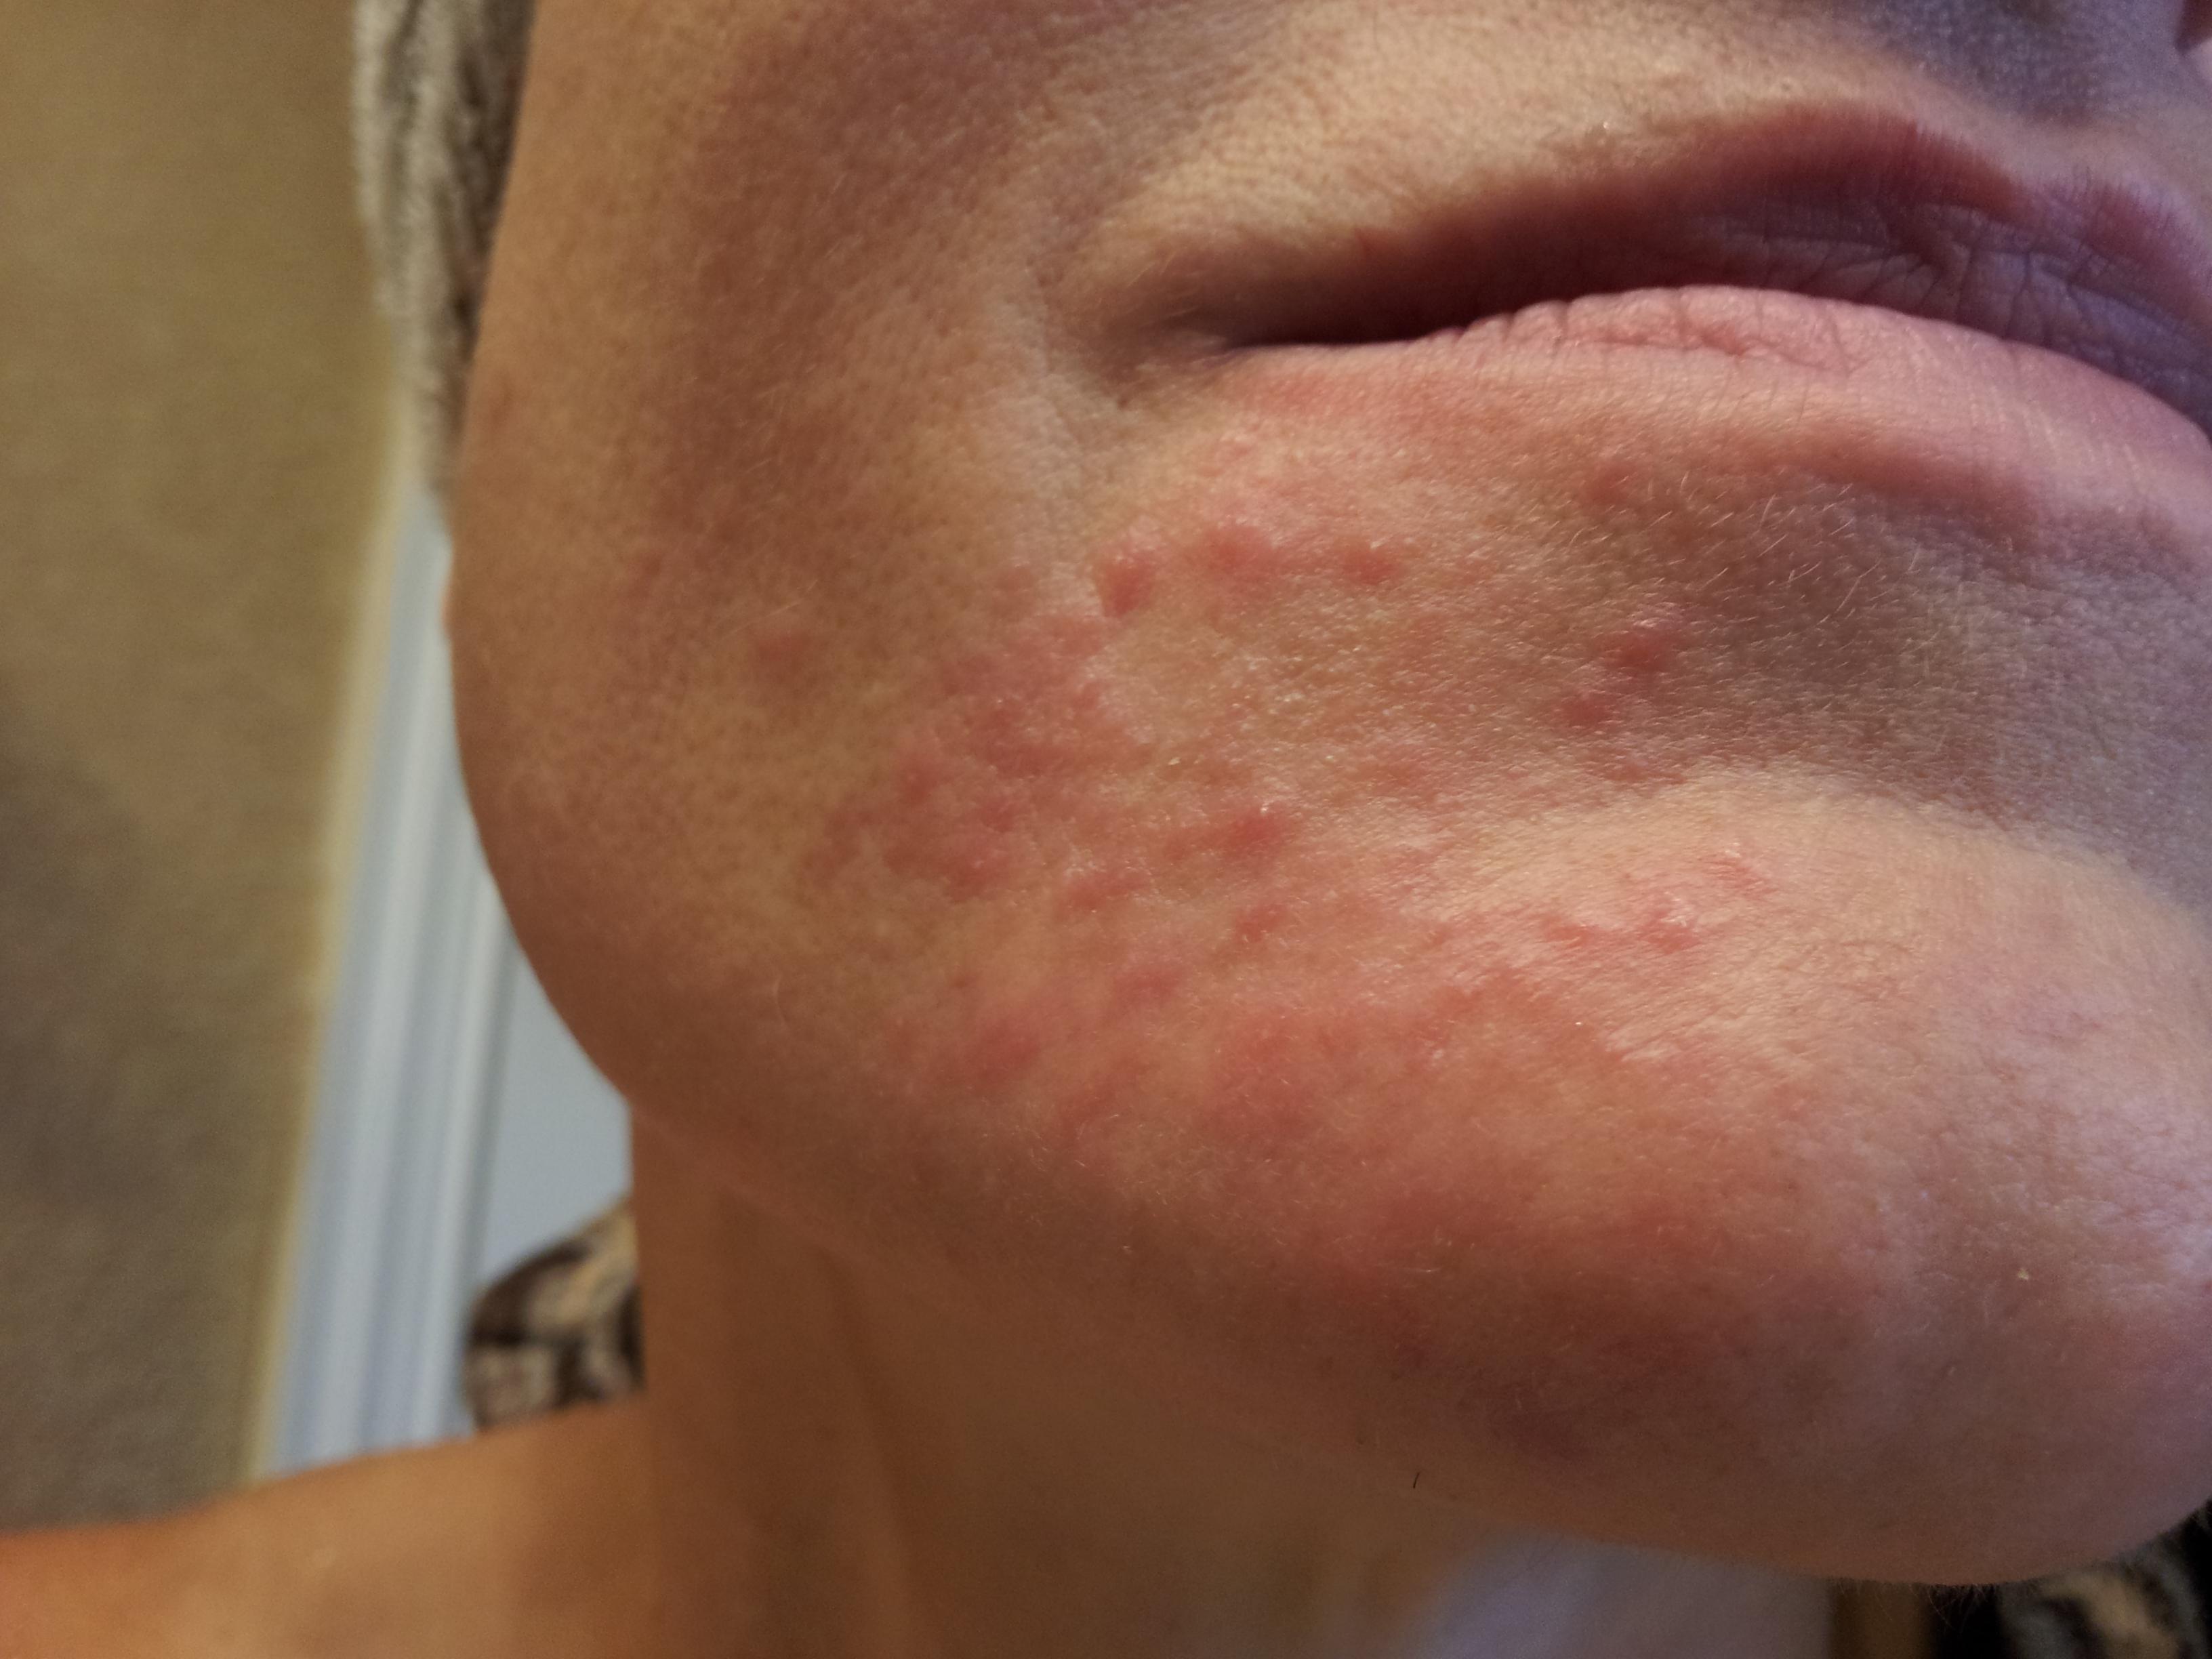 facial nerve impingement